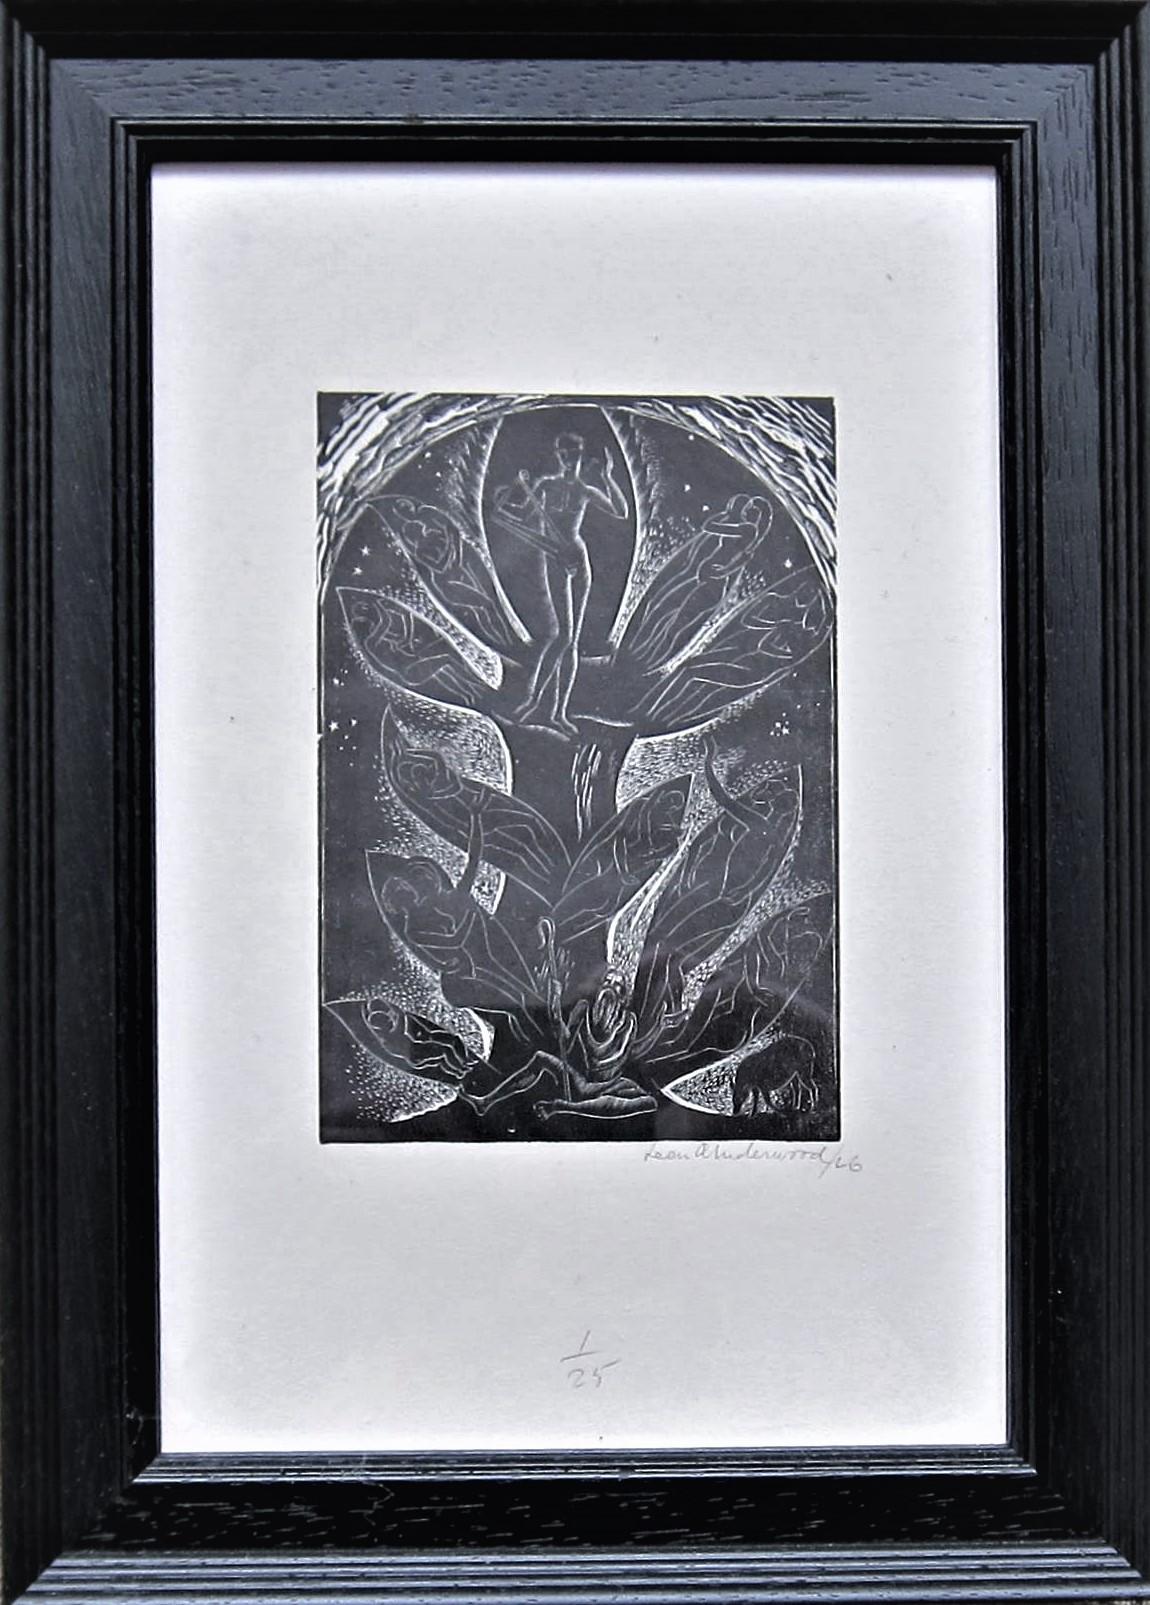 LEON UNDERWOOD [1890-1975]. Figure & Tree [Music..], 1926. wood engraving, edition of 25; 1/25; - Image 2 of 2